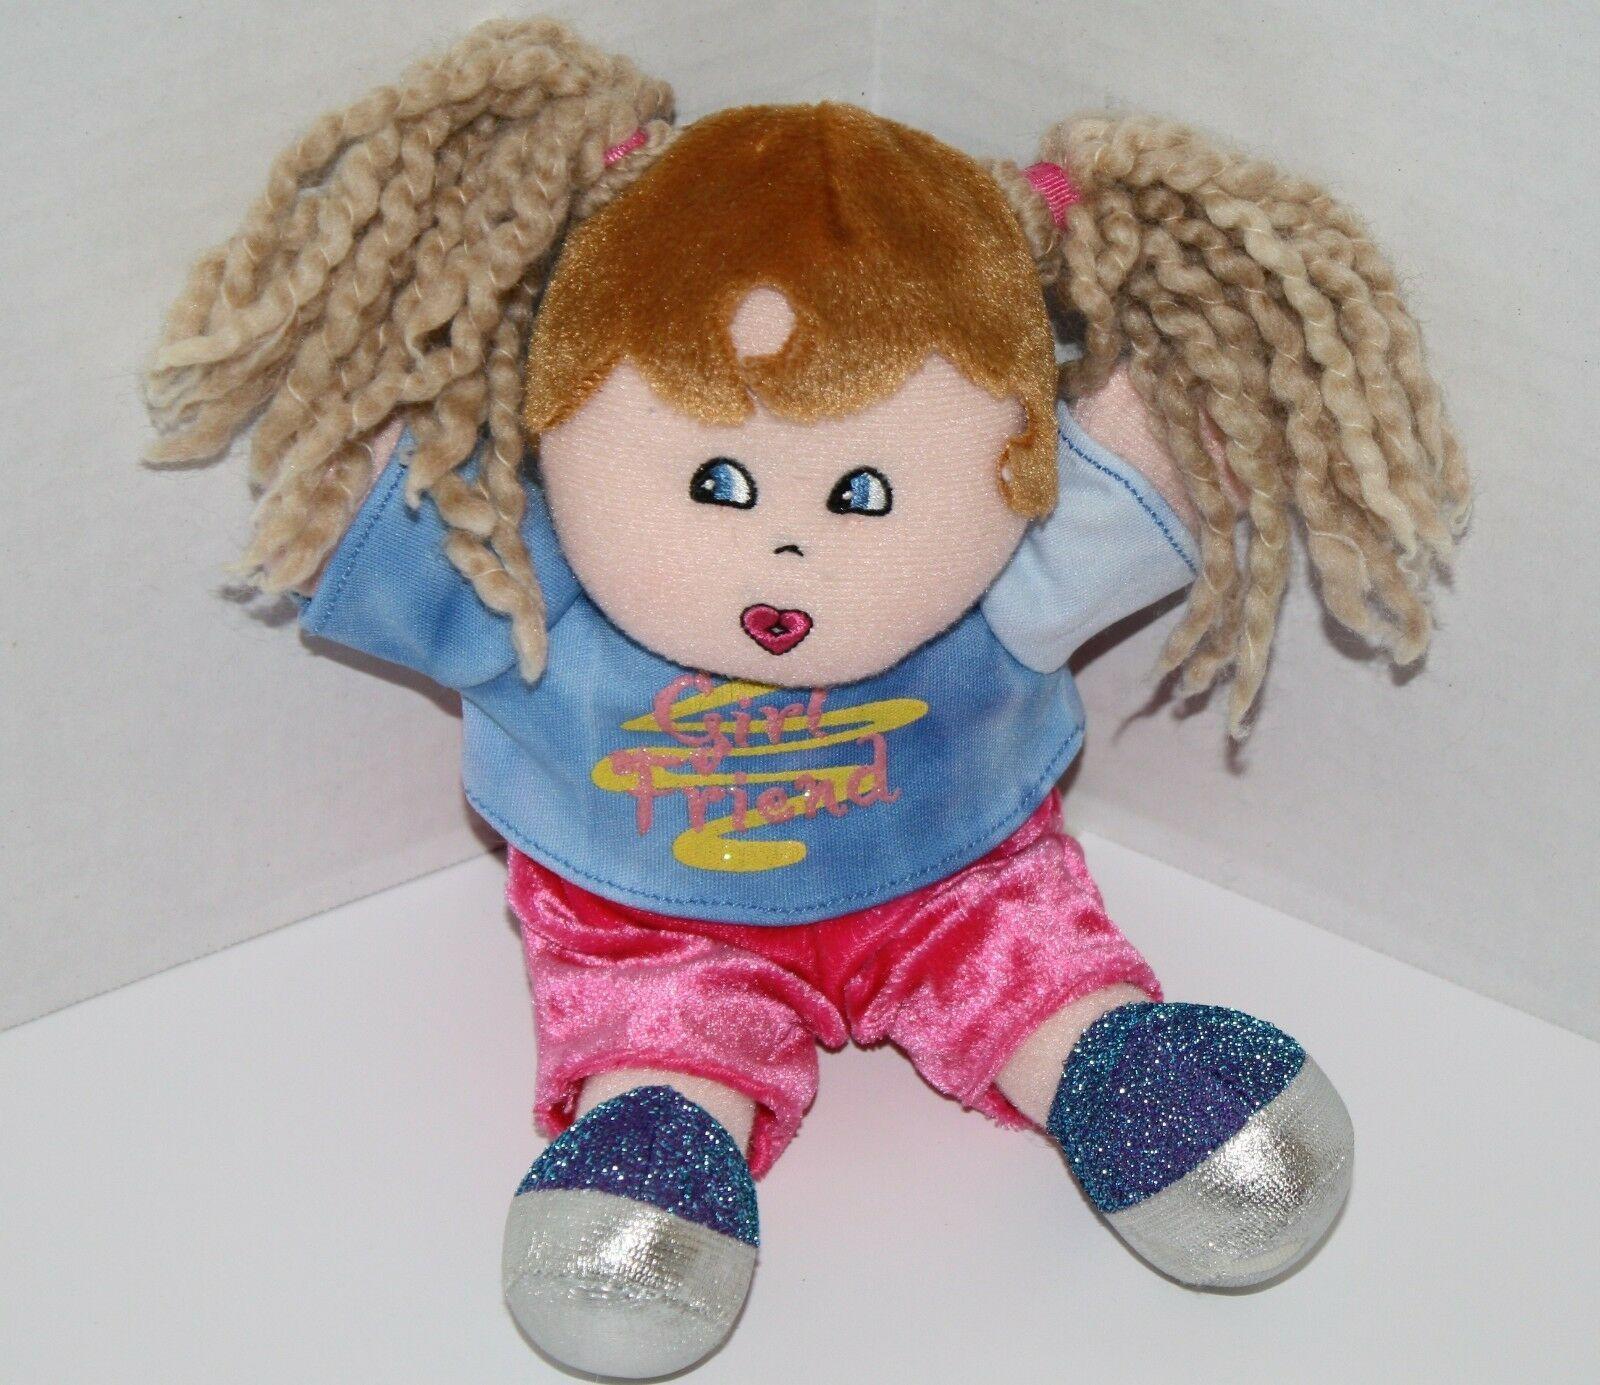 "Dan Dee Plush DOLL 9"" Girl Friend Blonde Yarn Pigtails Brown Hair Stuffed Soft"